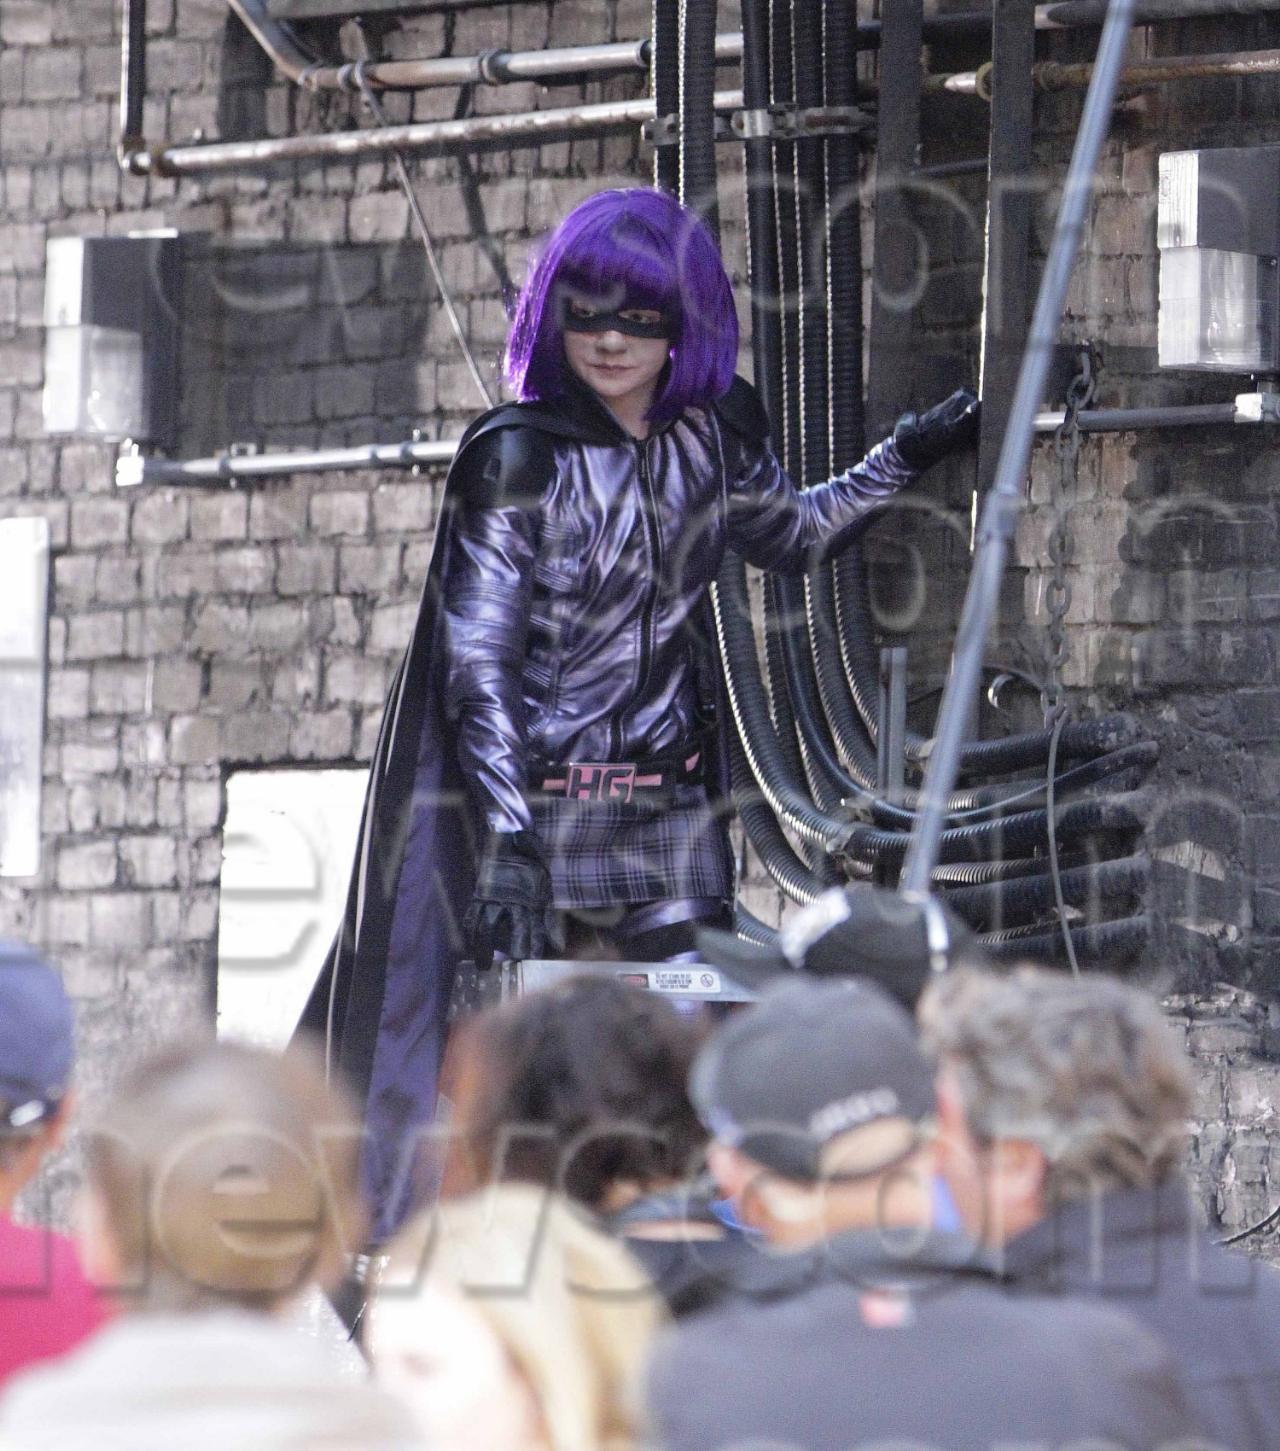 http://4.bp.blogspot.com/-wtN8T1pOFhg/UFj4XbX0K4I/AAAAAAAAIk4/Cu9gsiCNghI/s1600/hitgirl-kick-ass-2-costume.jpg